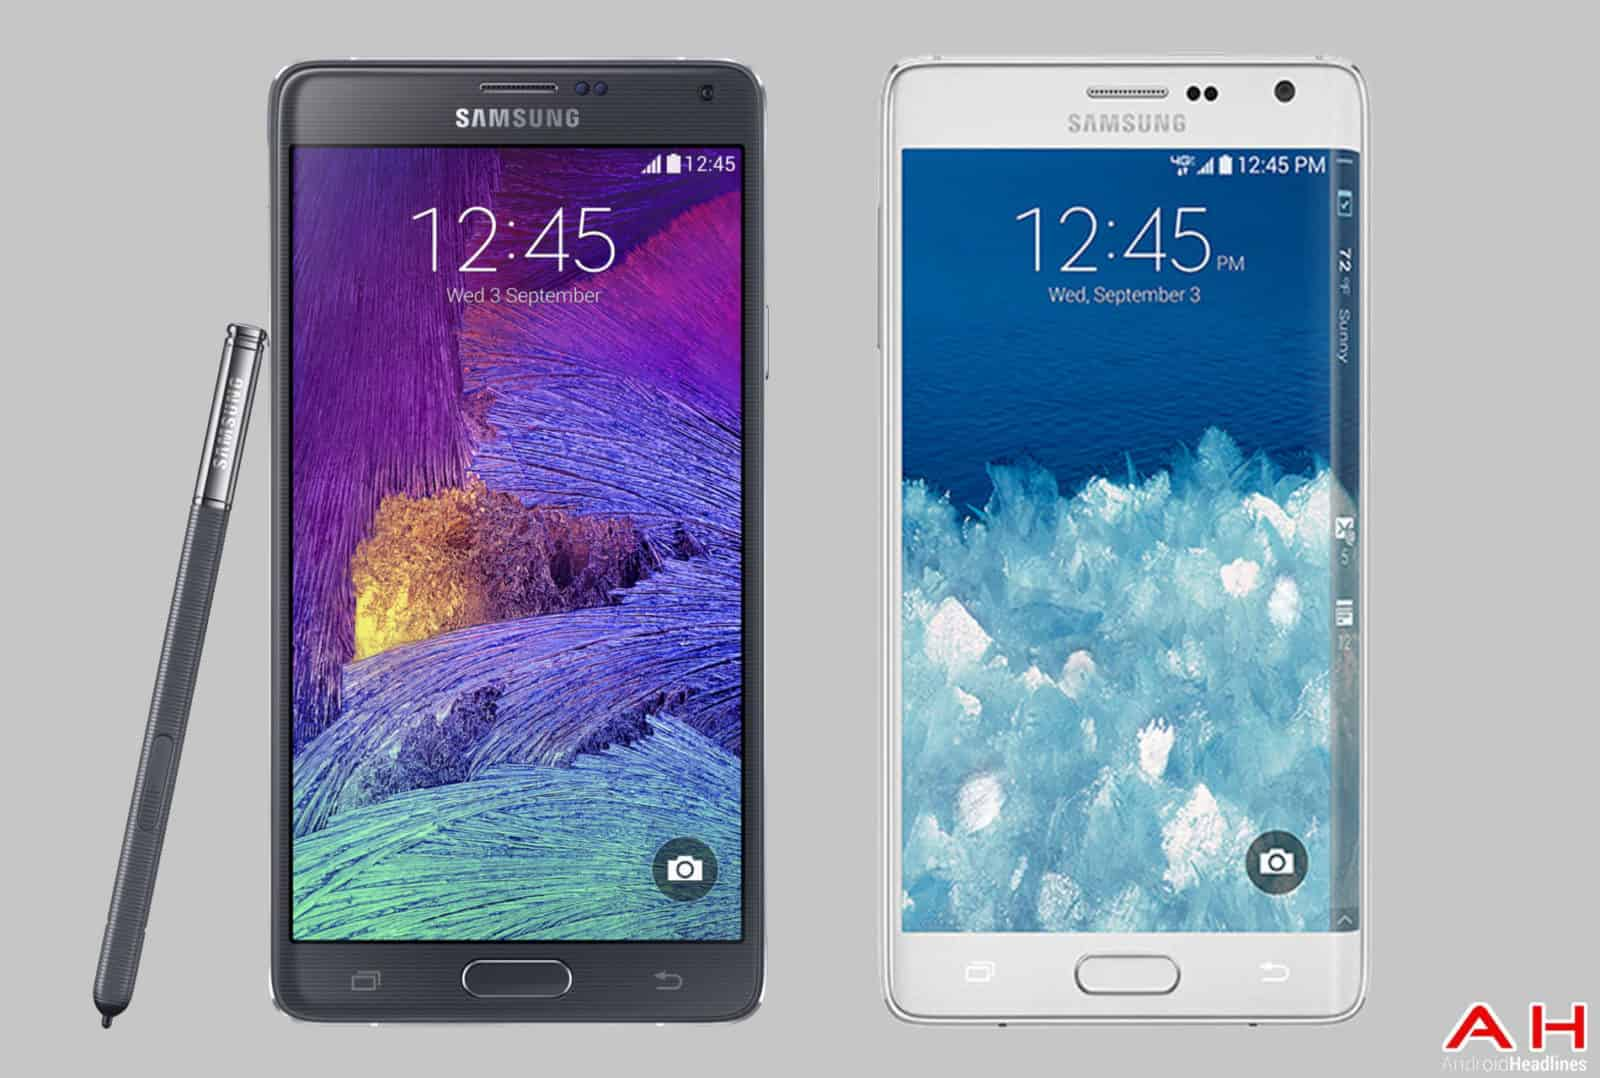 Samsung Galaxy Note 4 vs Samsung Note Edge cam 2AH